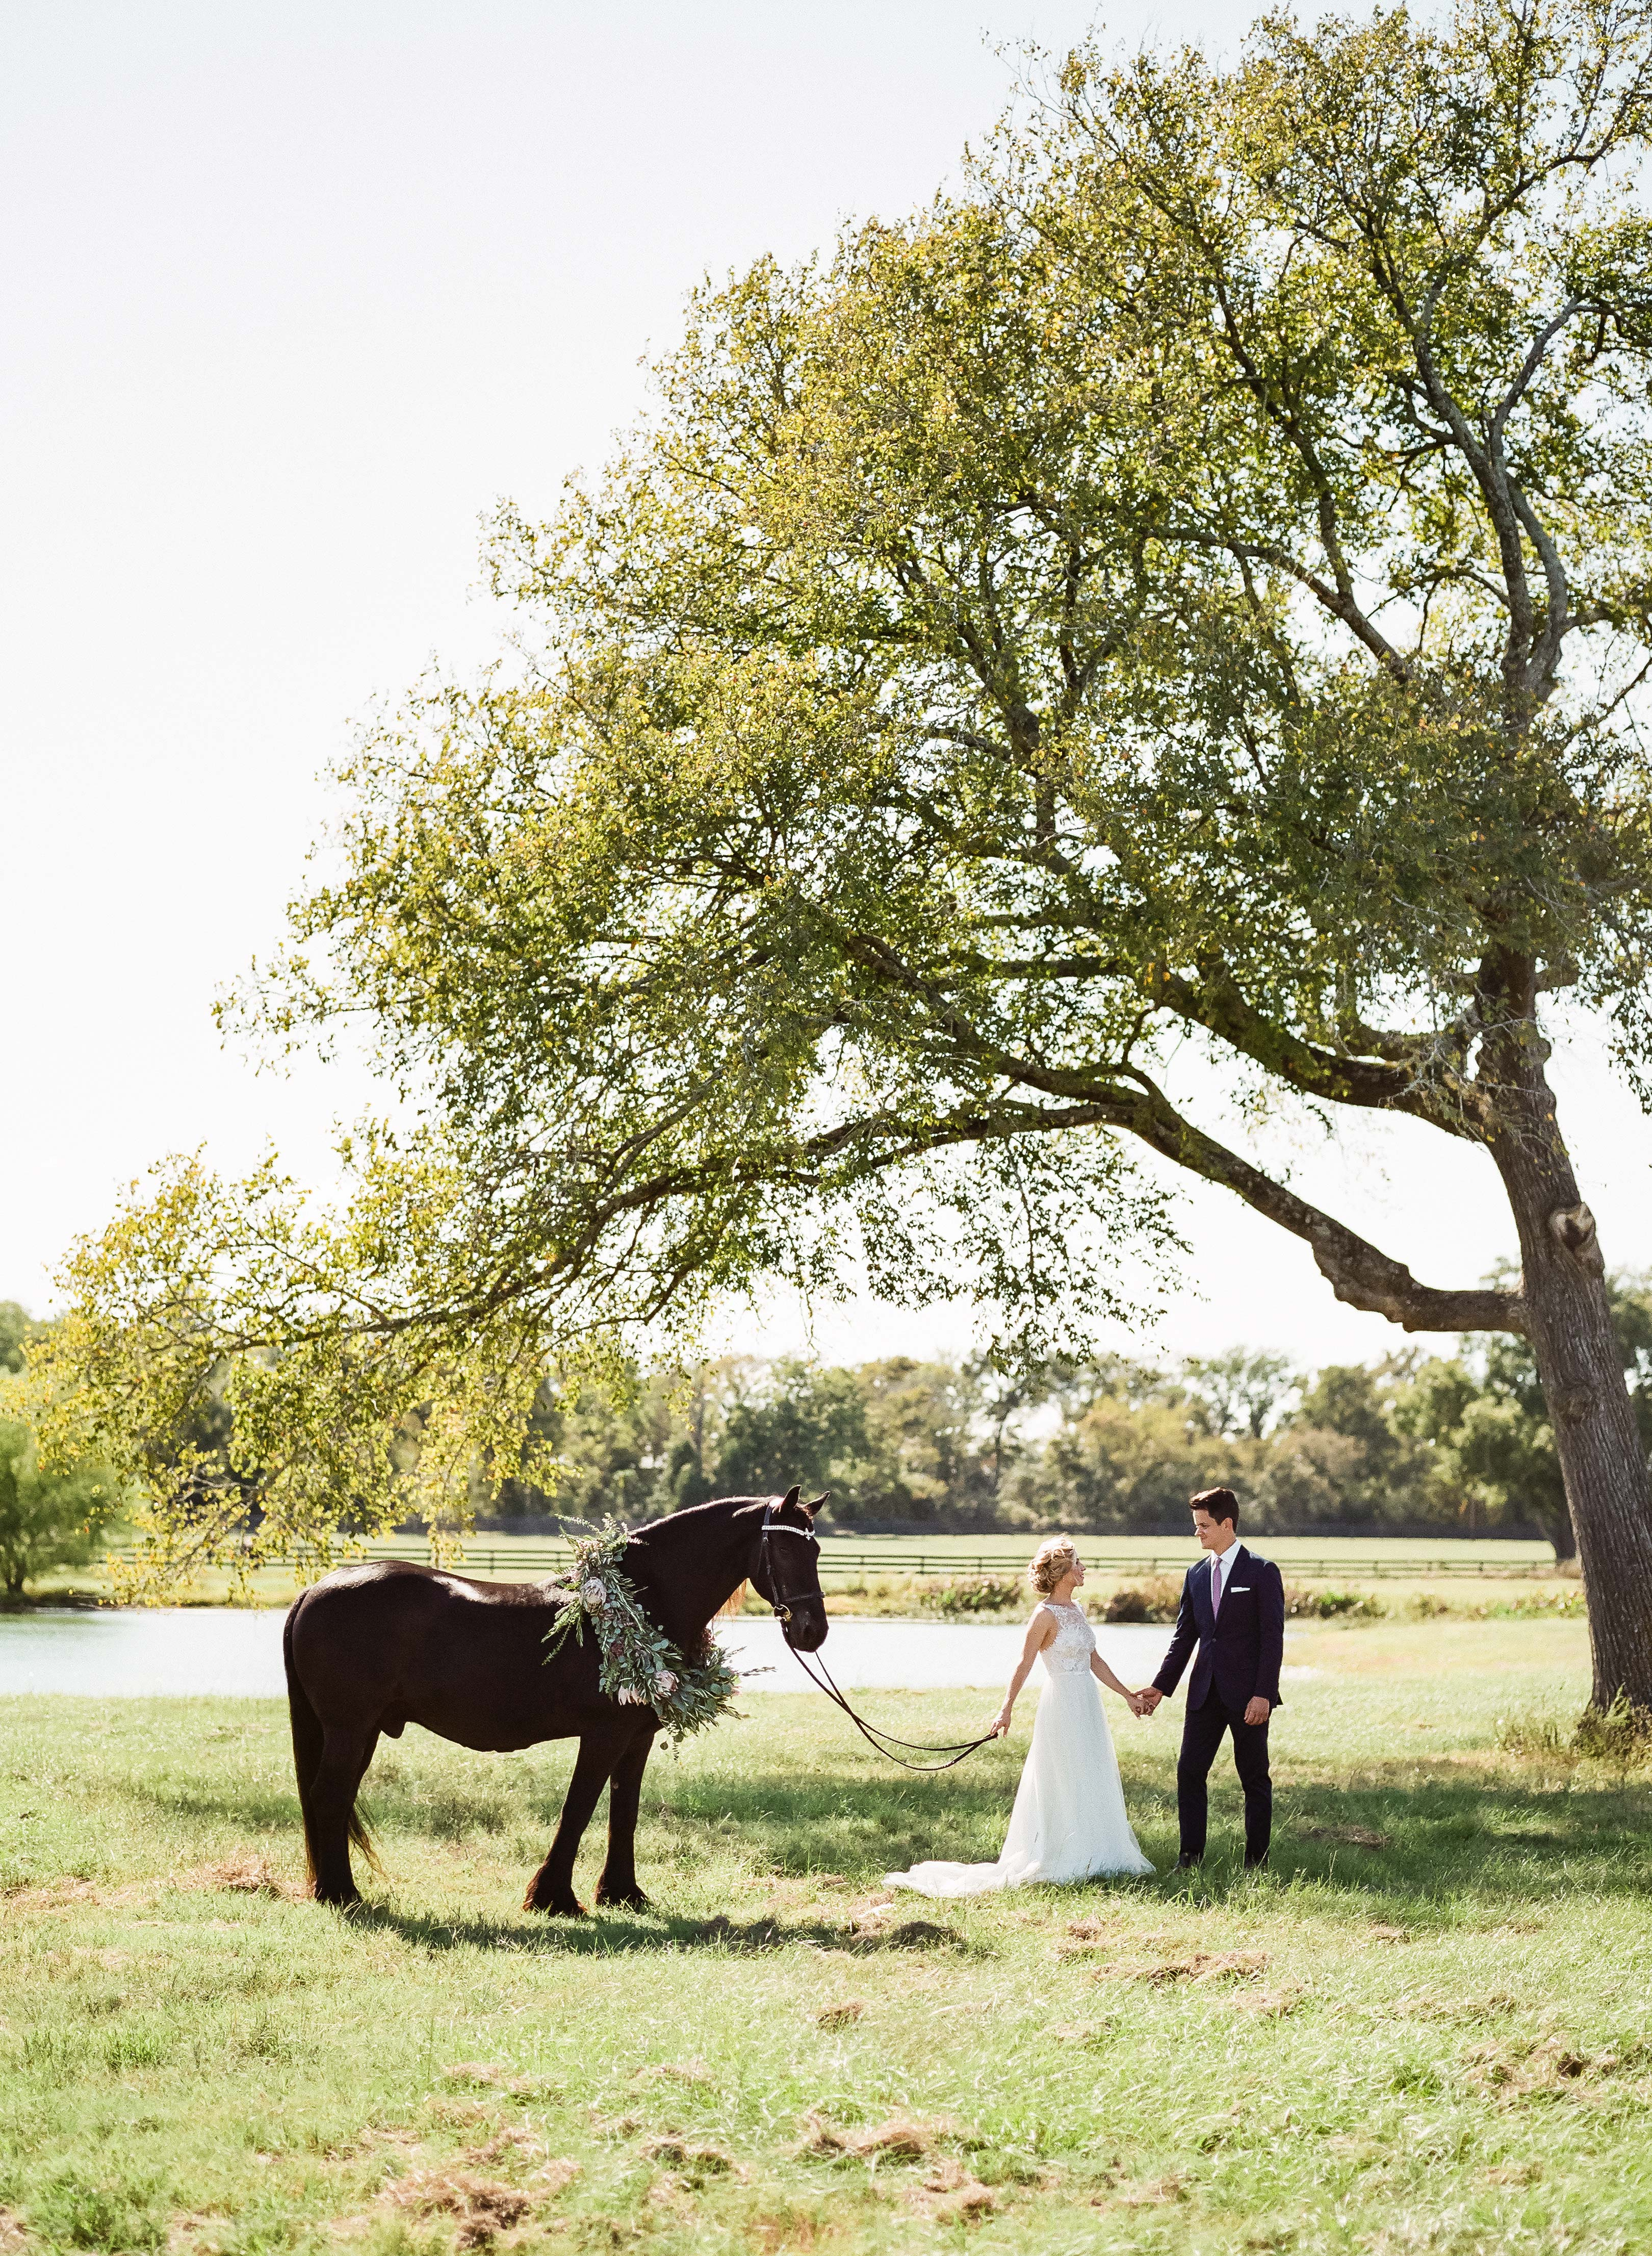 wedding couple with horse